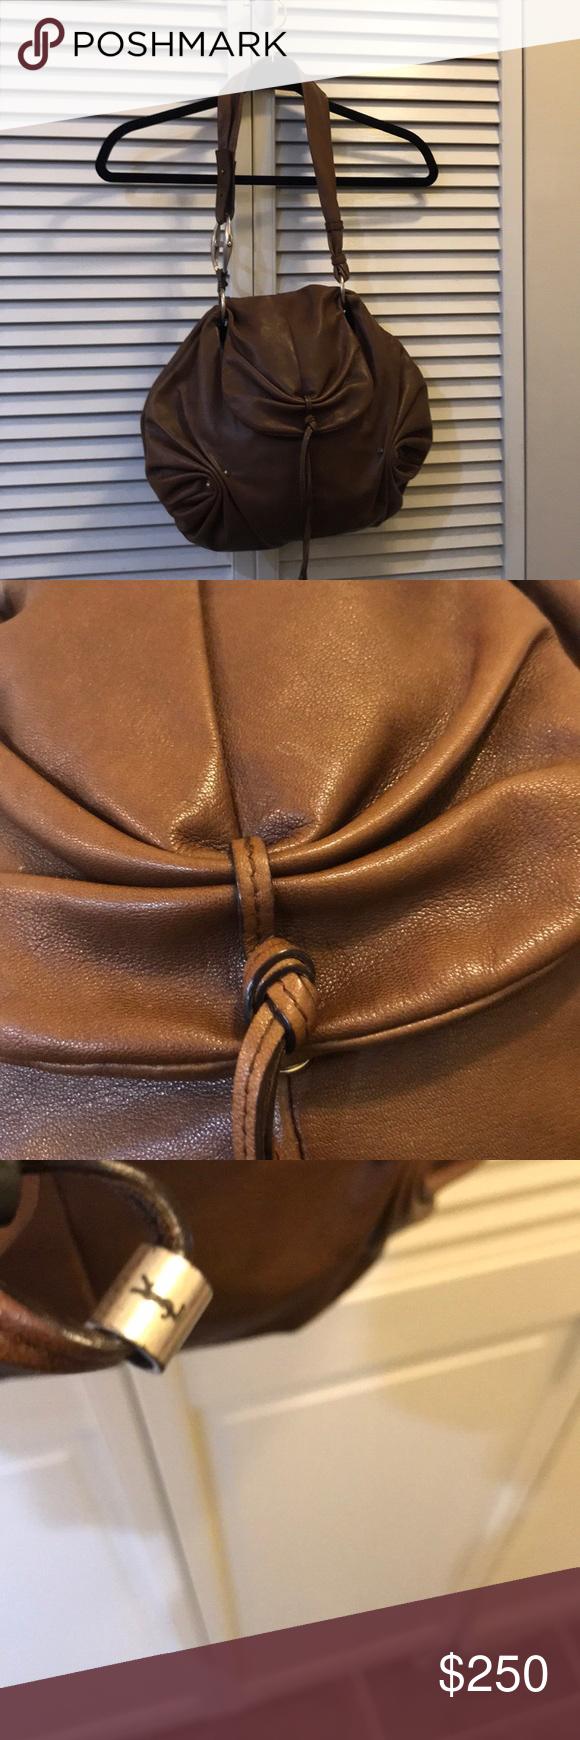 YSL MAMOUNIA BAG Brown goat leather closure